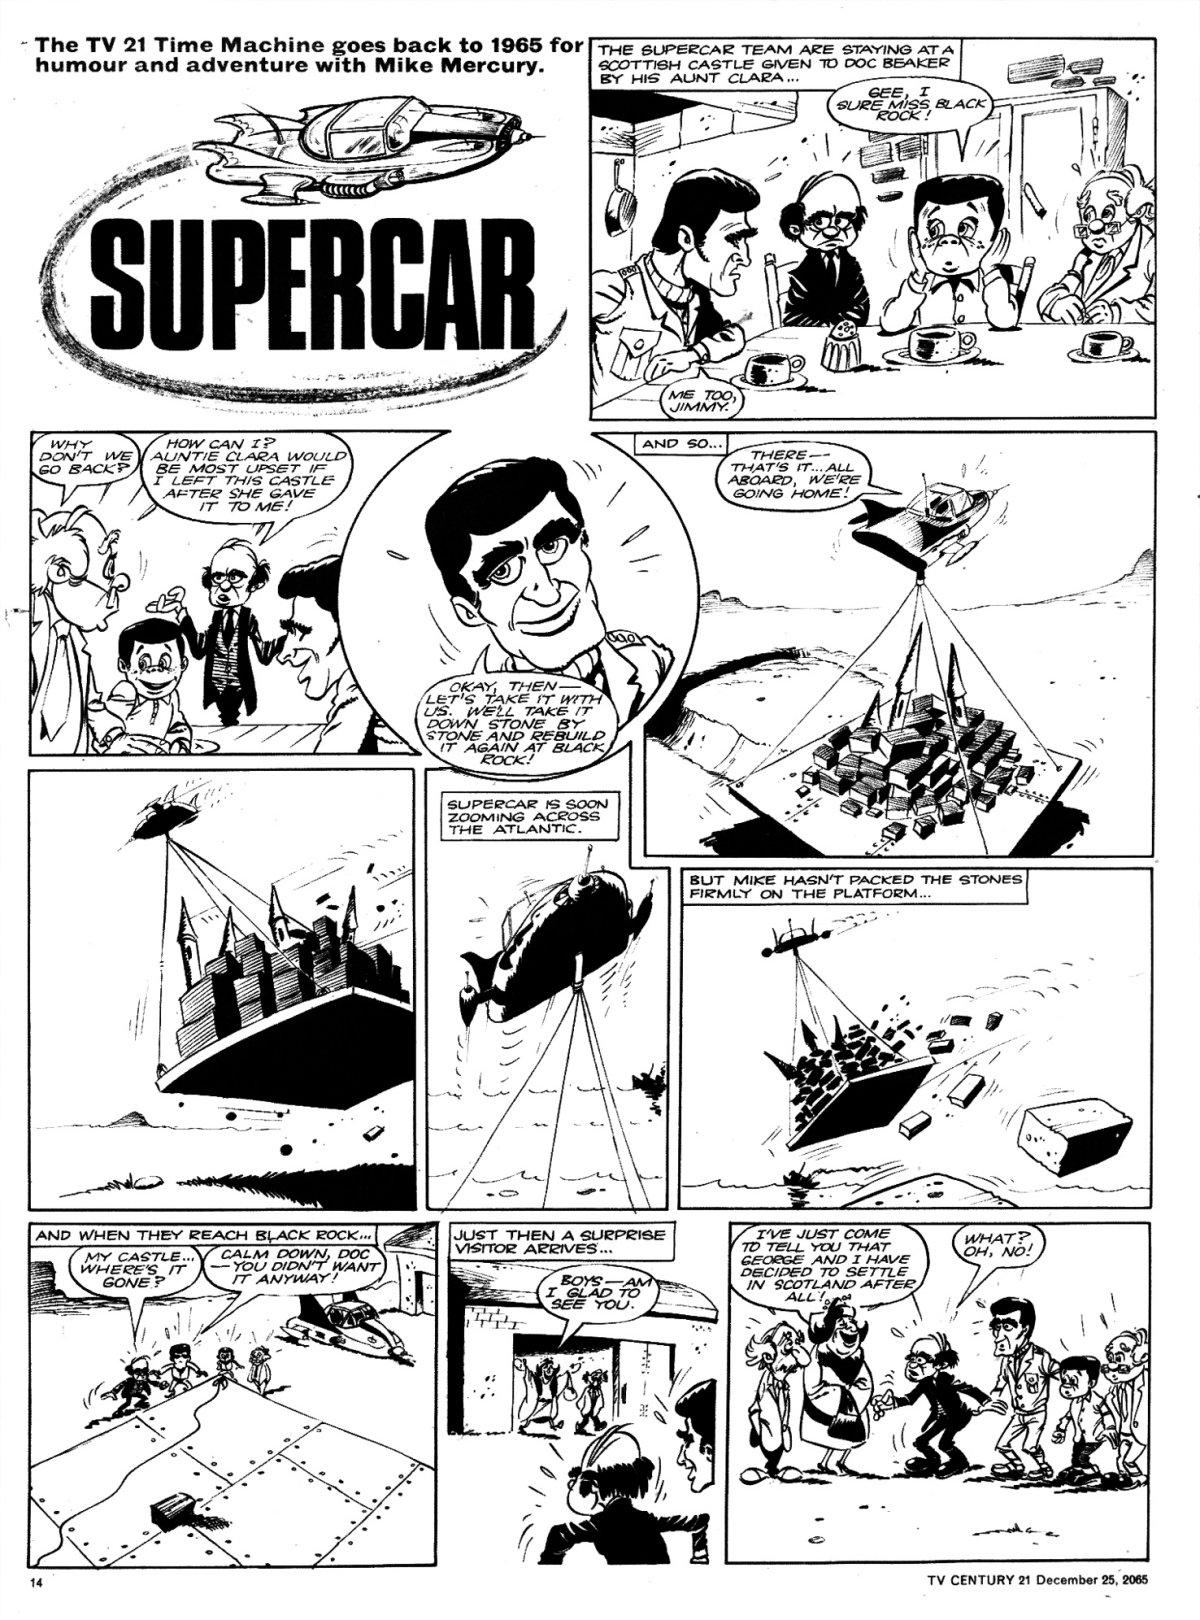 Read online TV Century 21 (TV 21) comic -  Issue #49 - 13